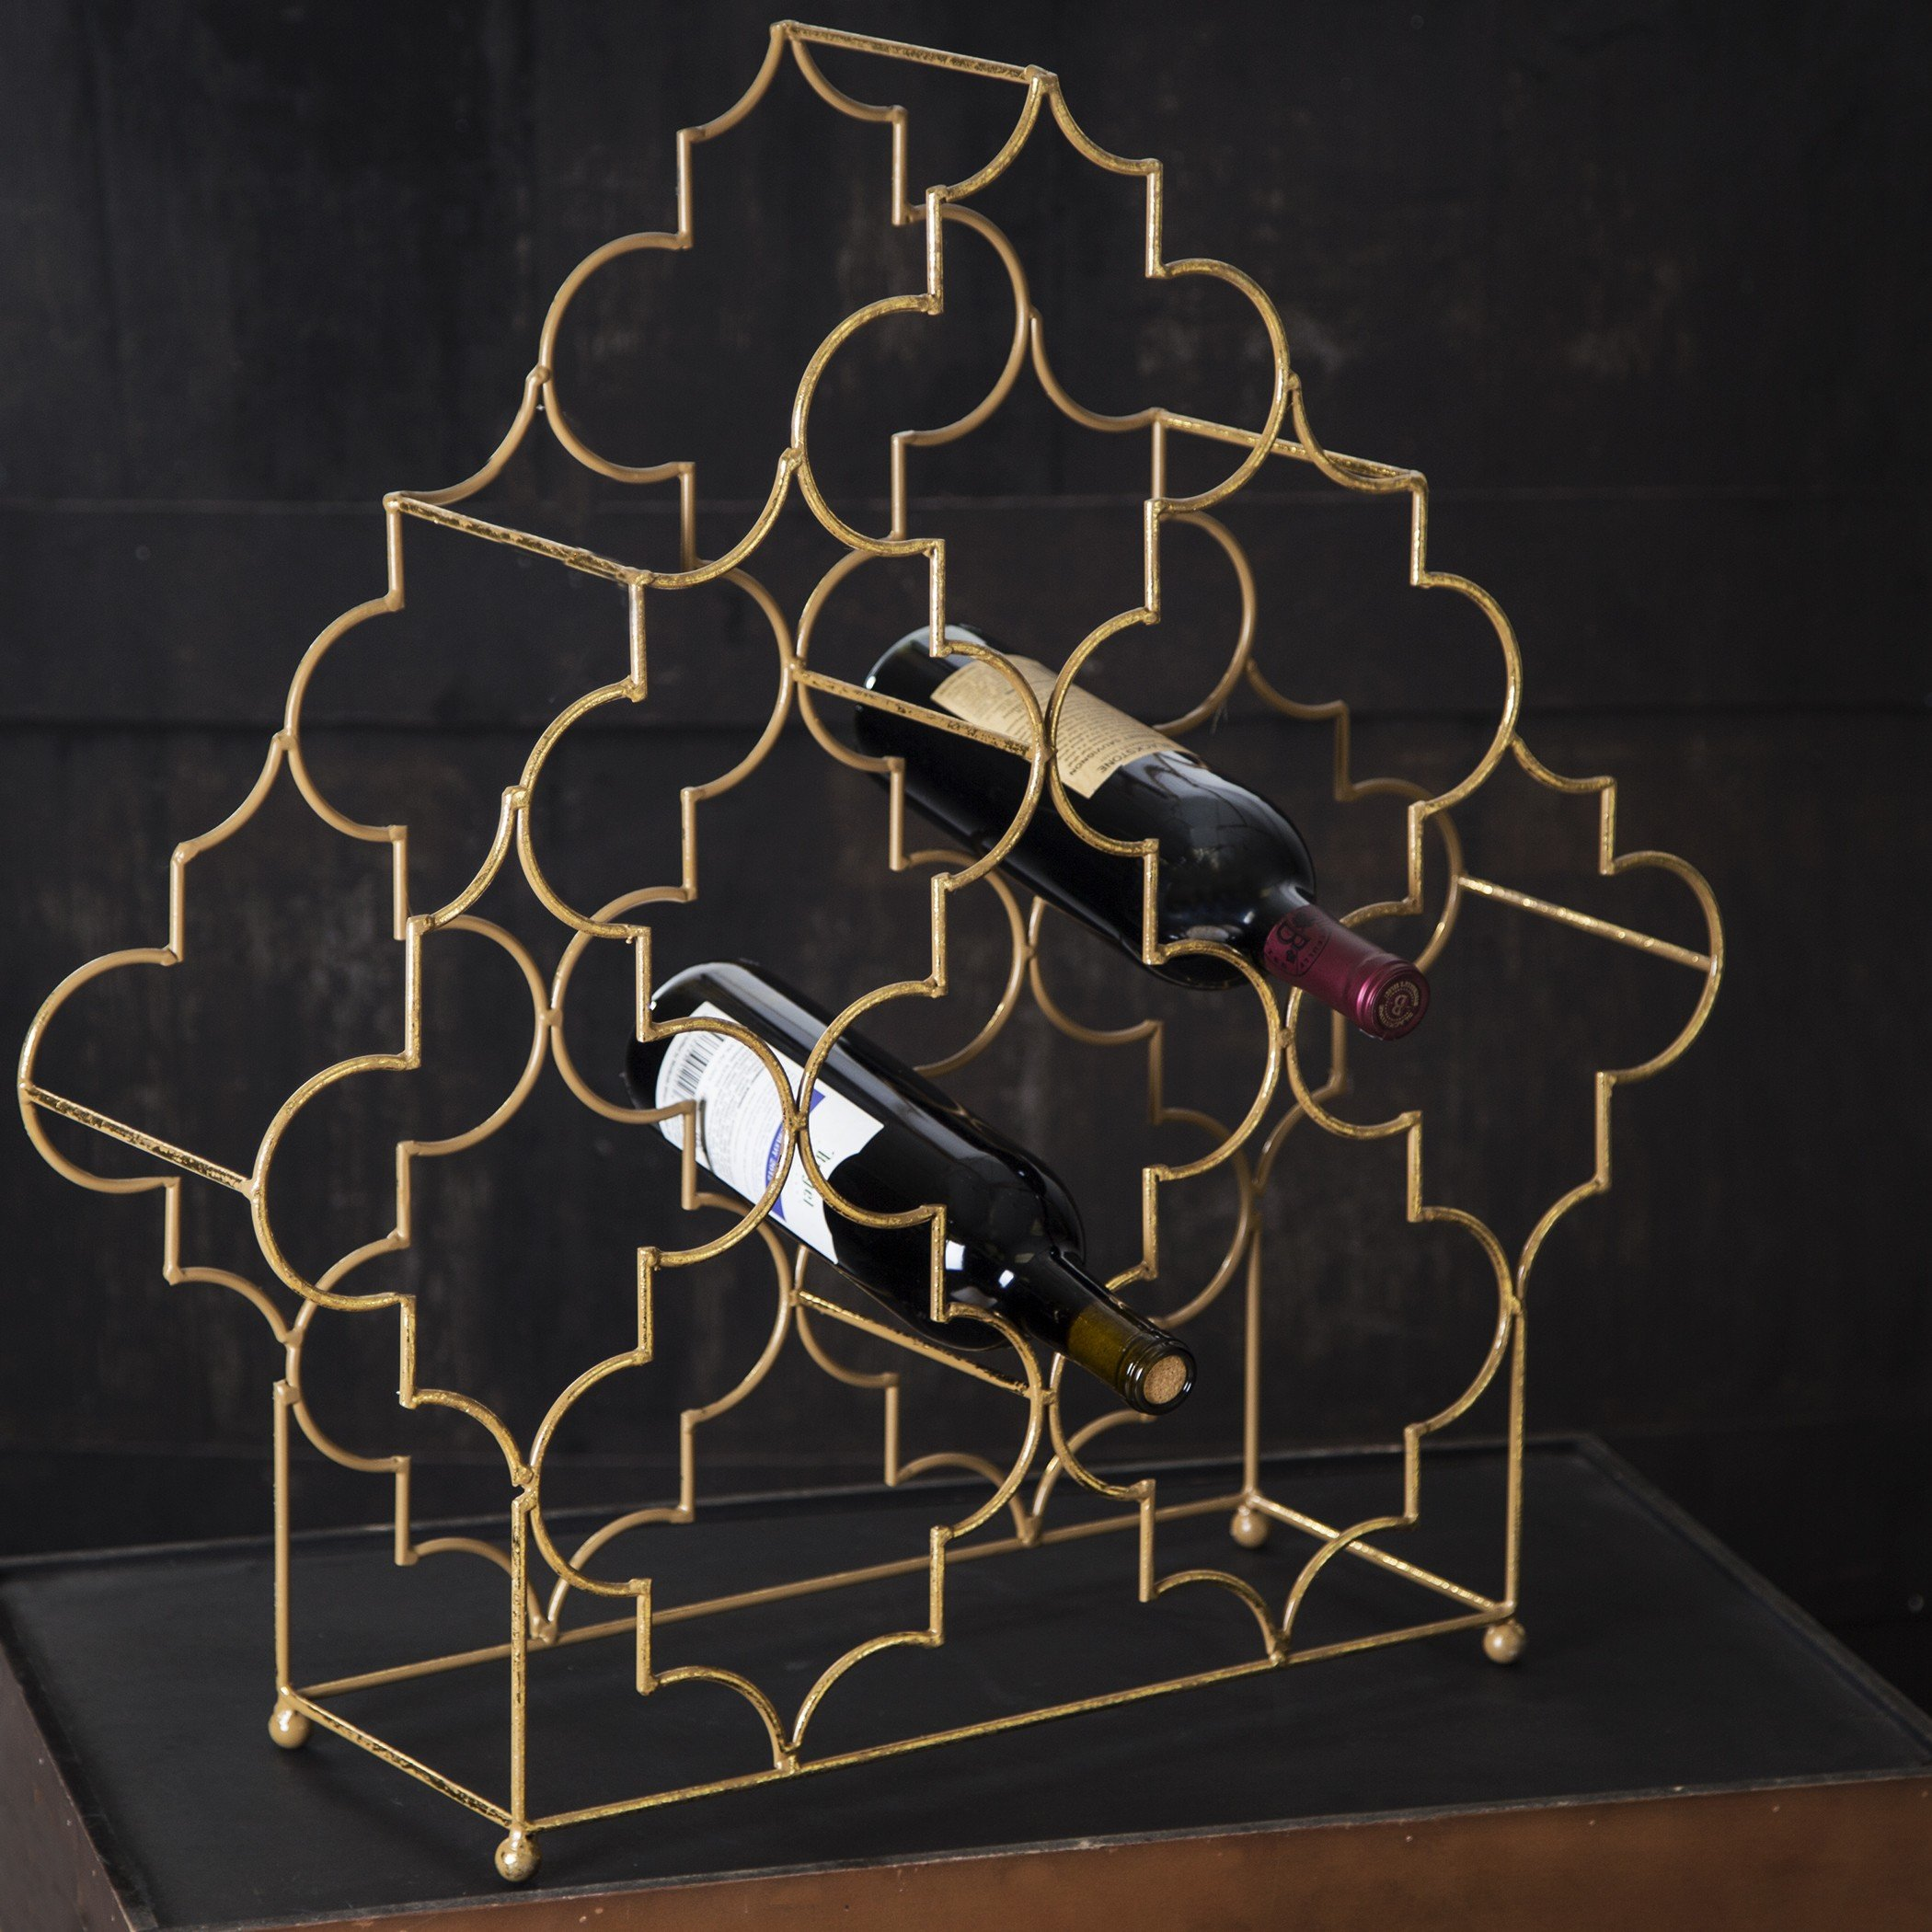 Elegant Modular 4 Tier Wine Rack, Wine Storage, Free-Standing Wine Bottle Display, 24inches High Antique Gold Metallic Holder, Holds 8 - 32 Bottles of Your Favorite Wines